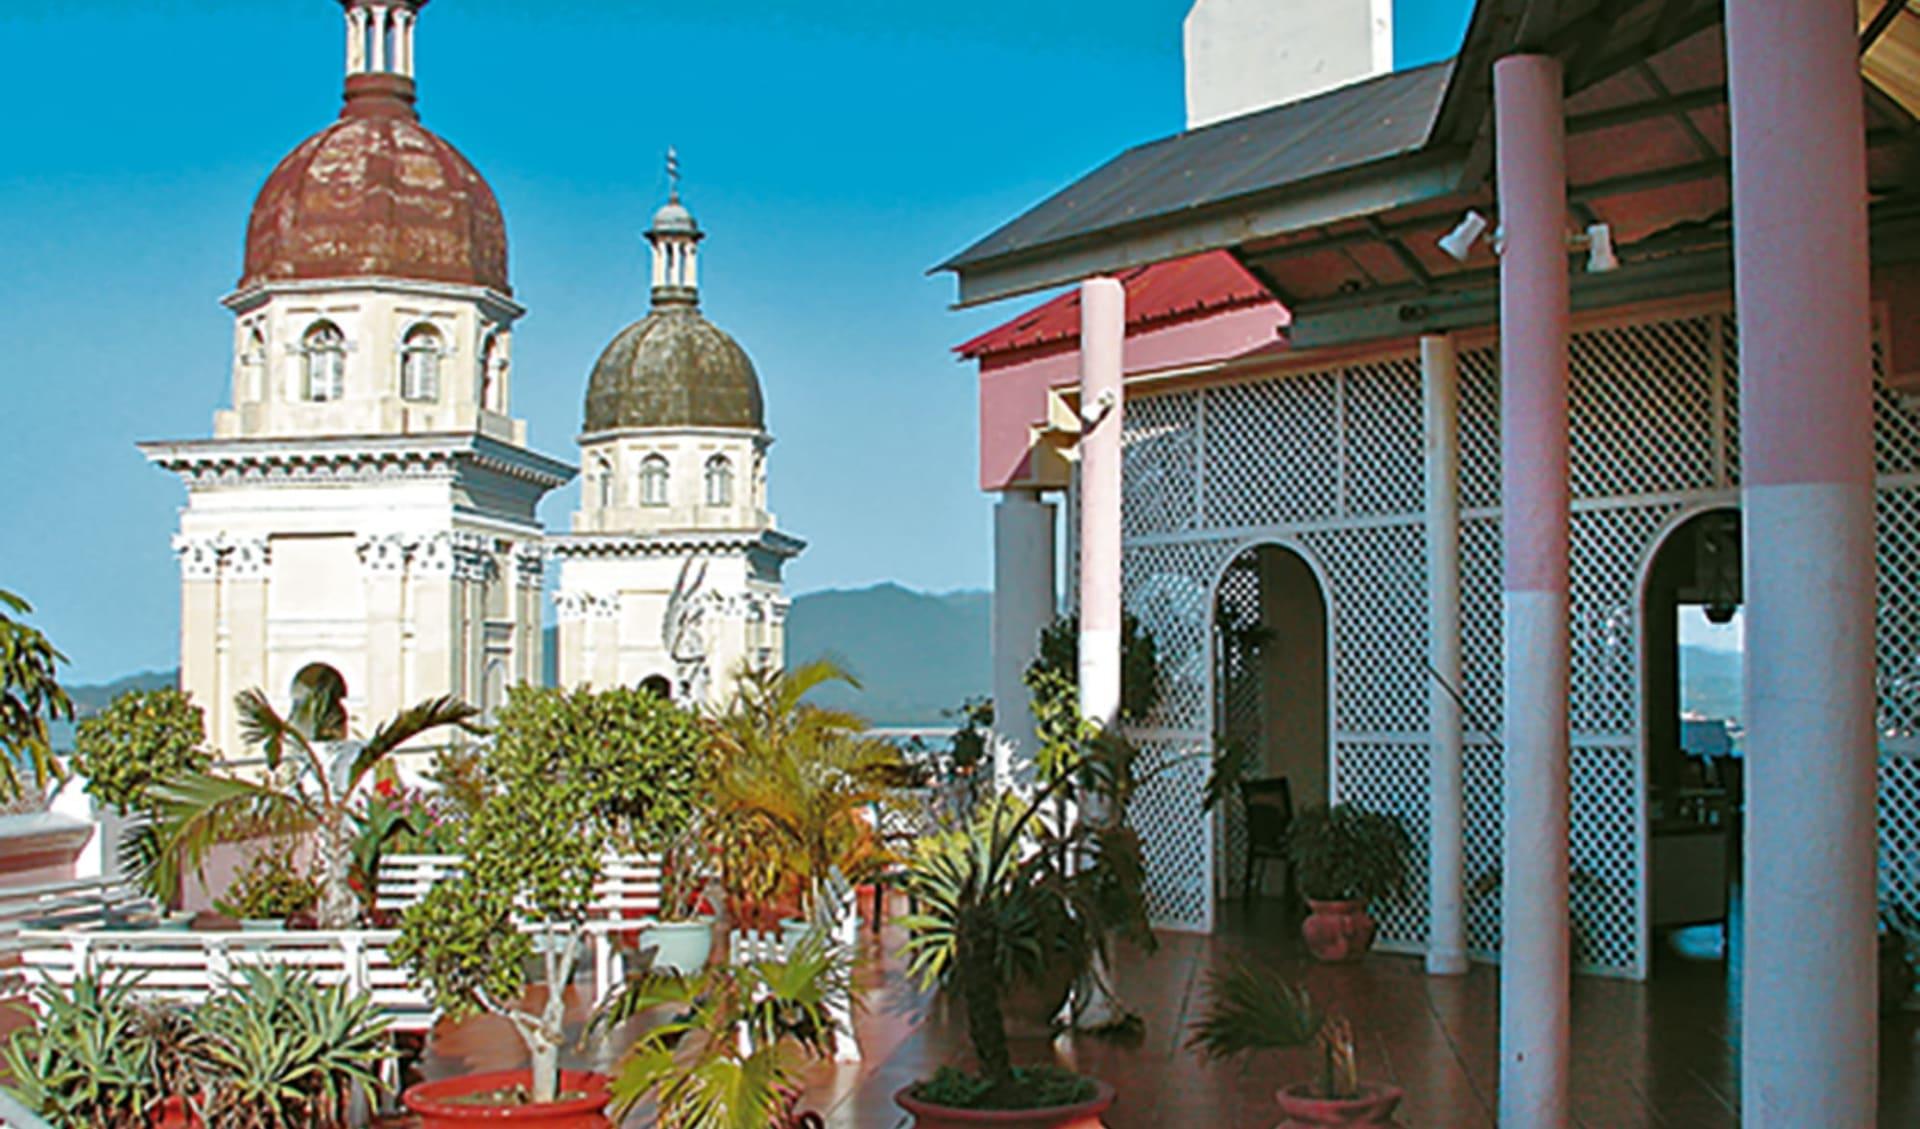 Casa Granda in Santiago de Cuba:  Santiago de Chile_Casa Granda_Dach